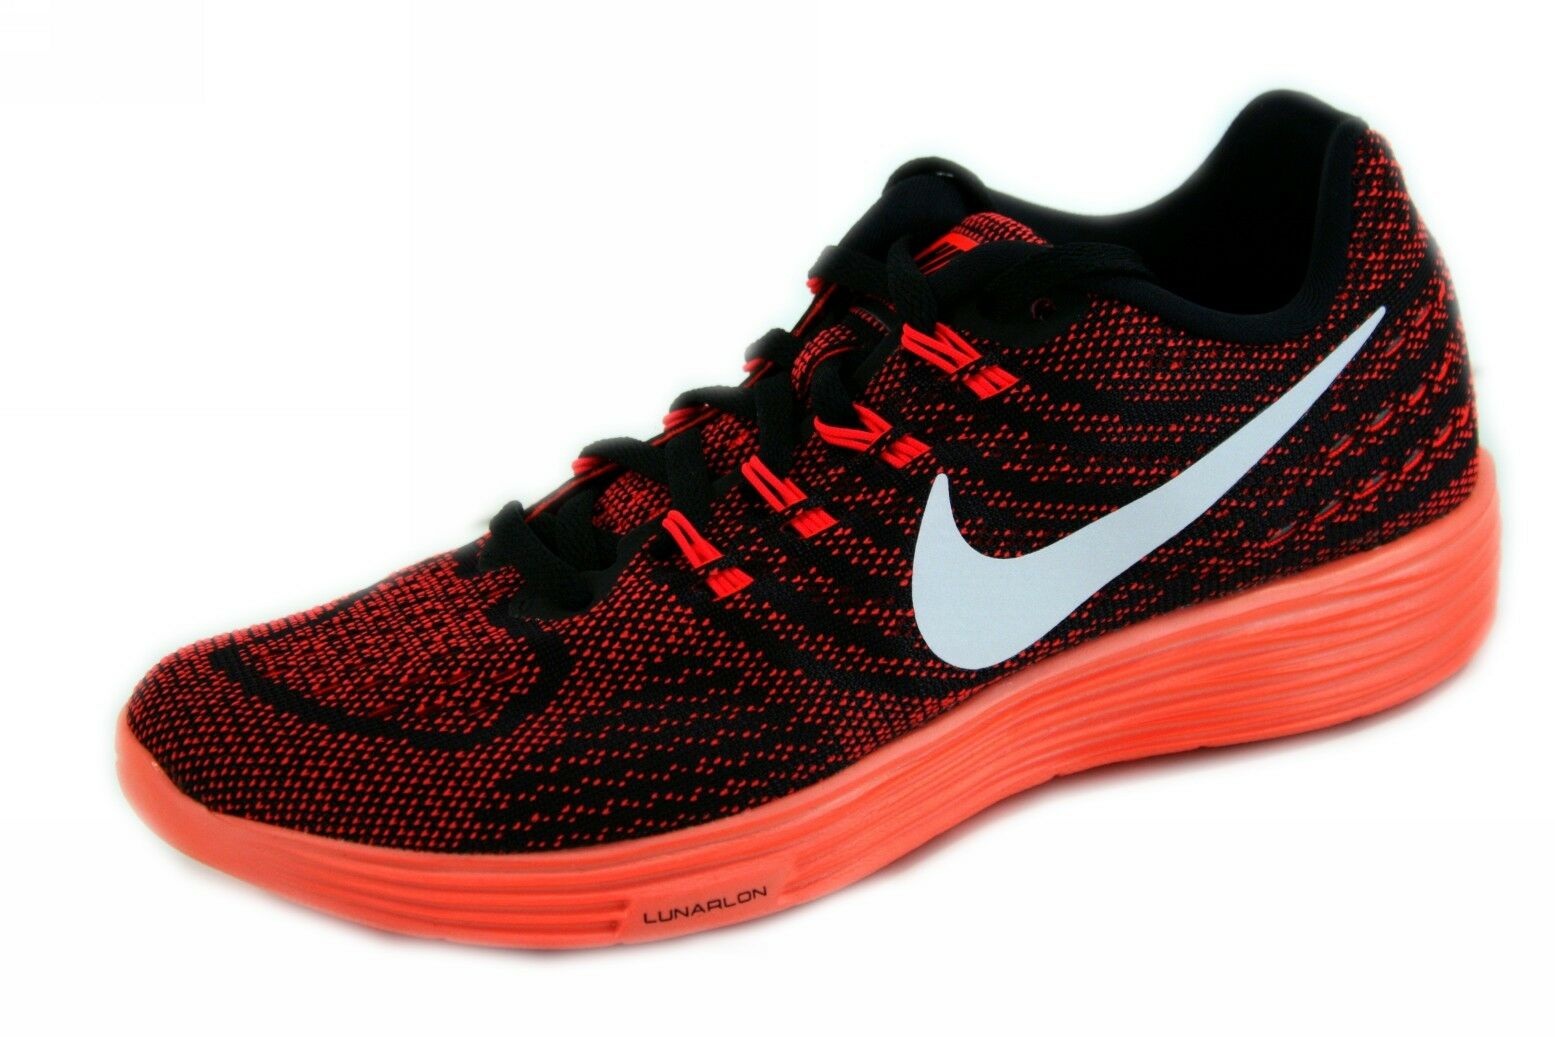 Nike Lunartempo 2 Bright Crimpson/White-Black-Bright Mango Running 818098600 8.5